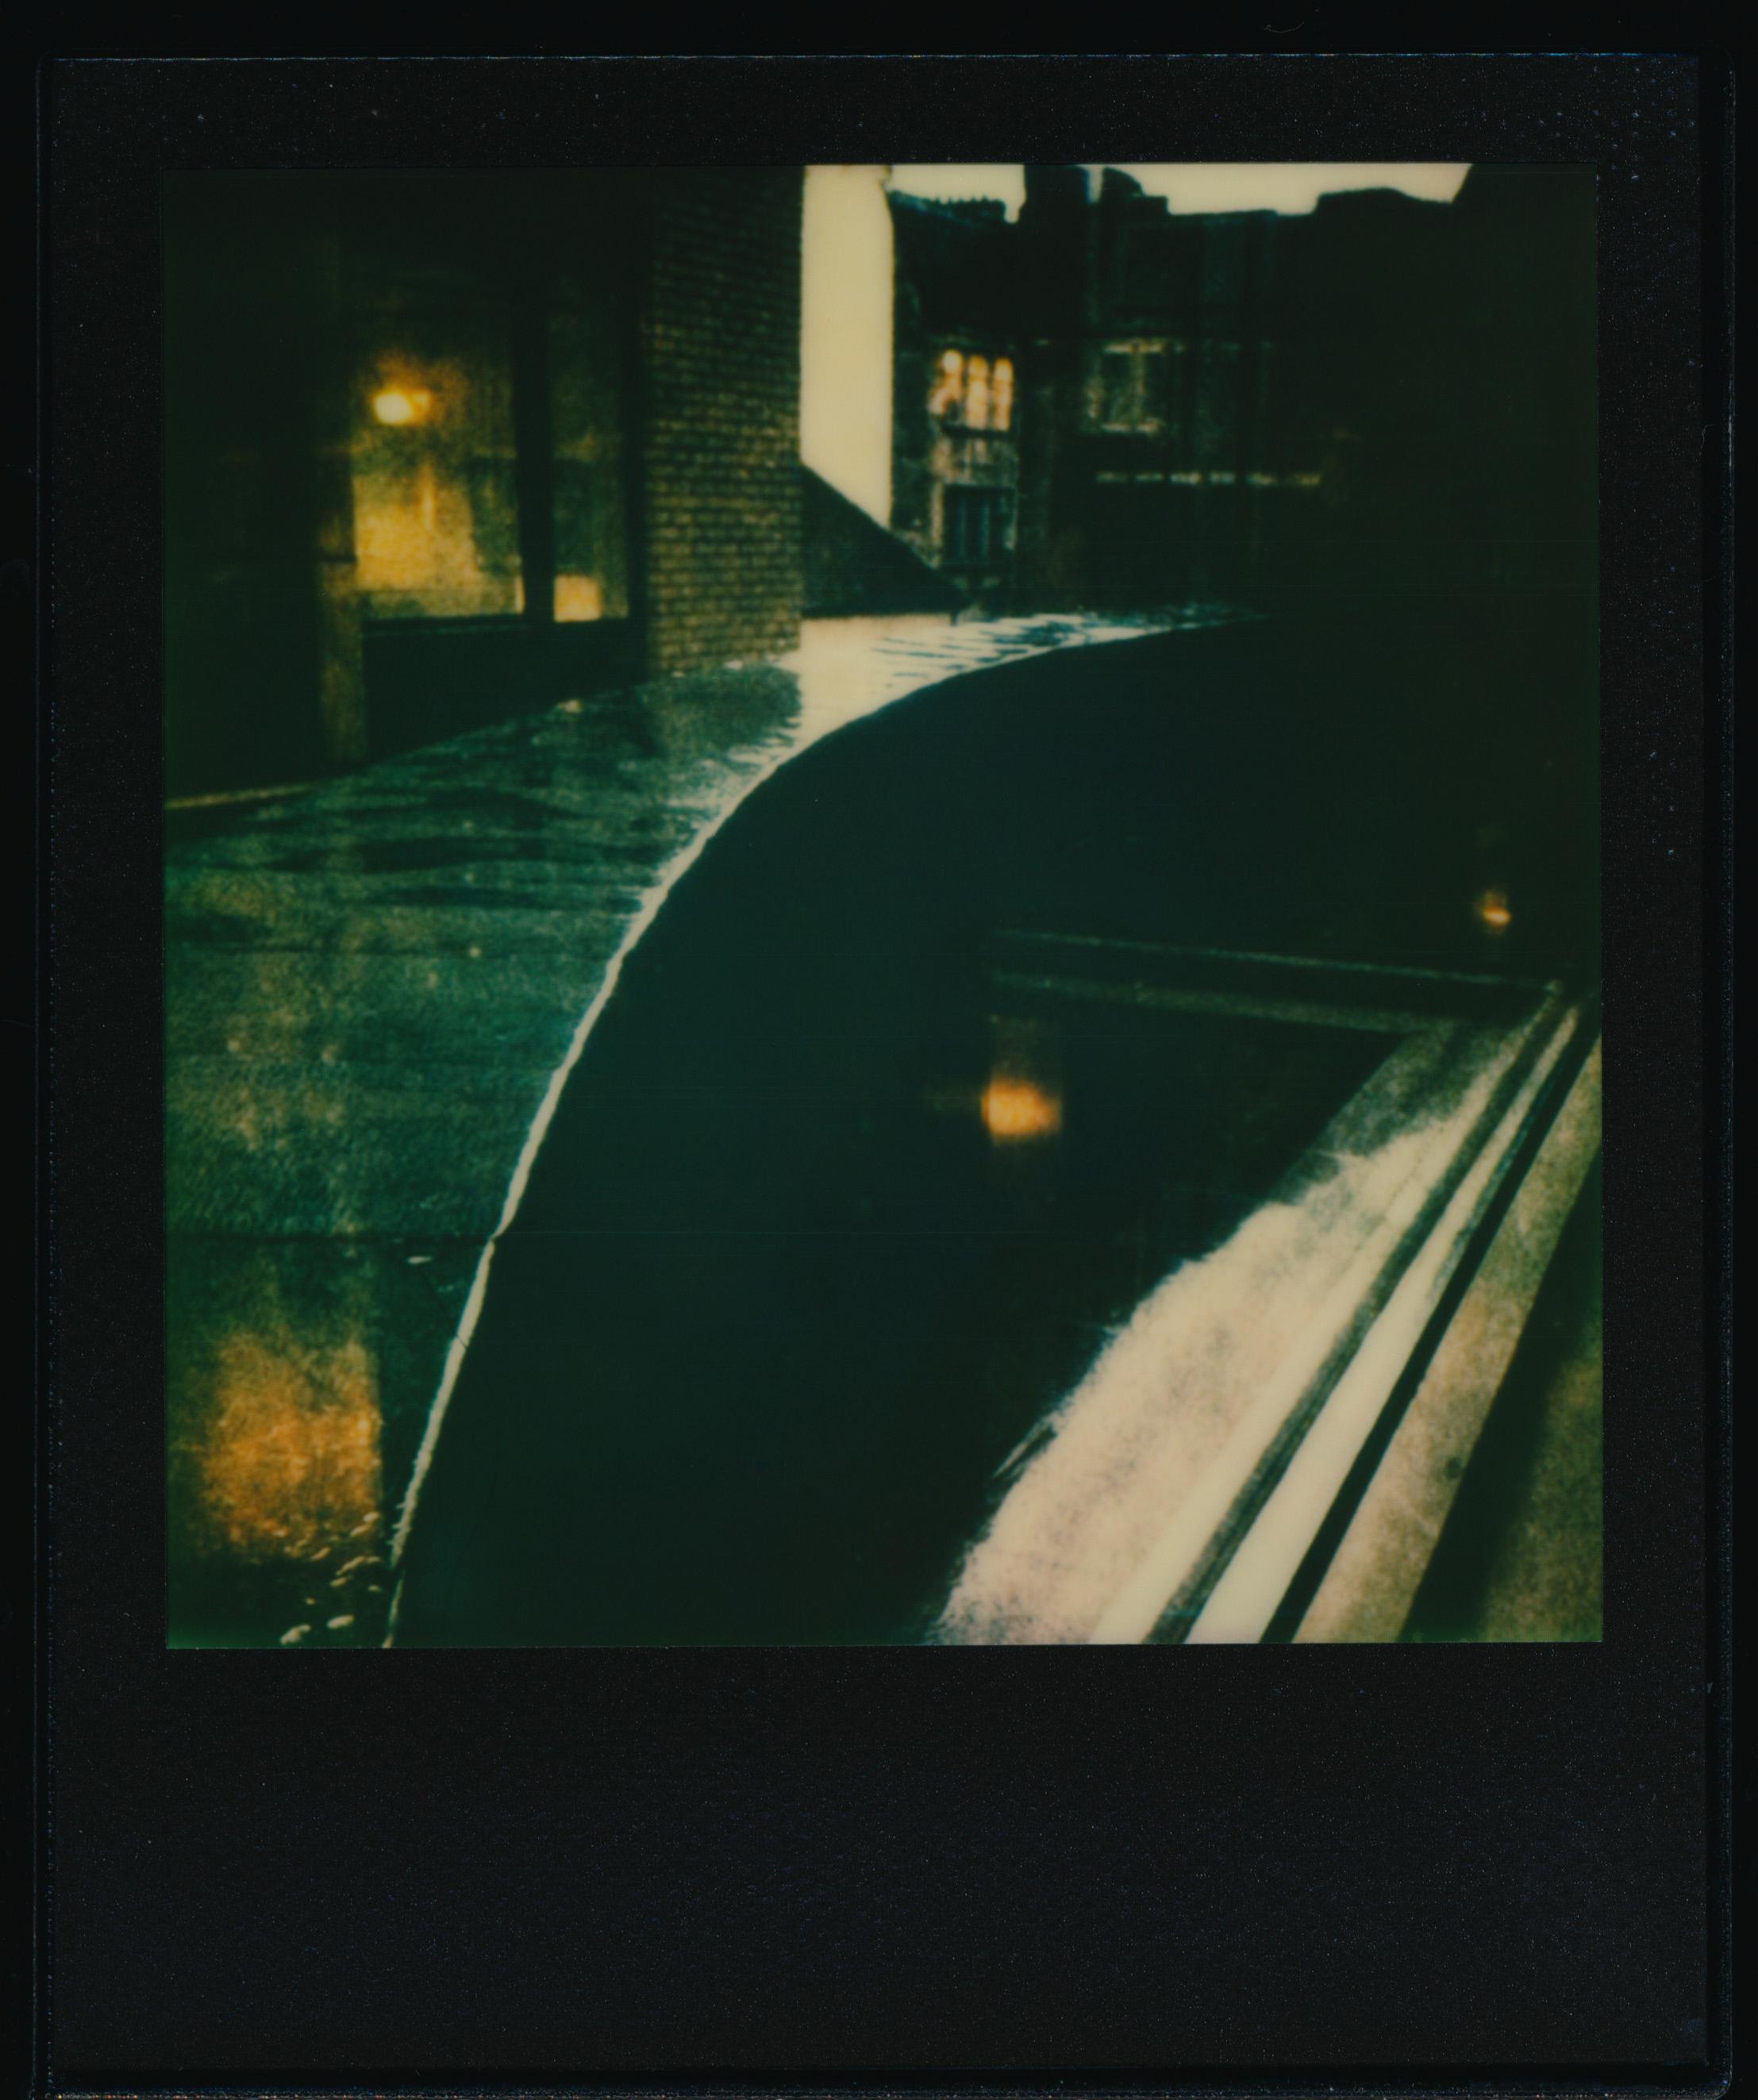 Glasgow | Impossible Project Instant Lab | Impossible Project 70 Color Film | Per Forsström